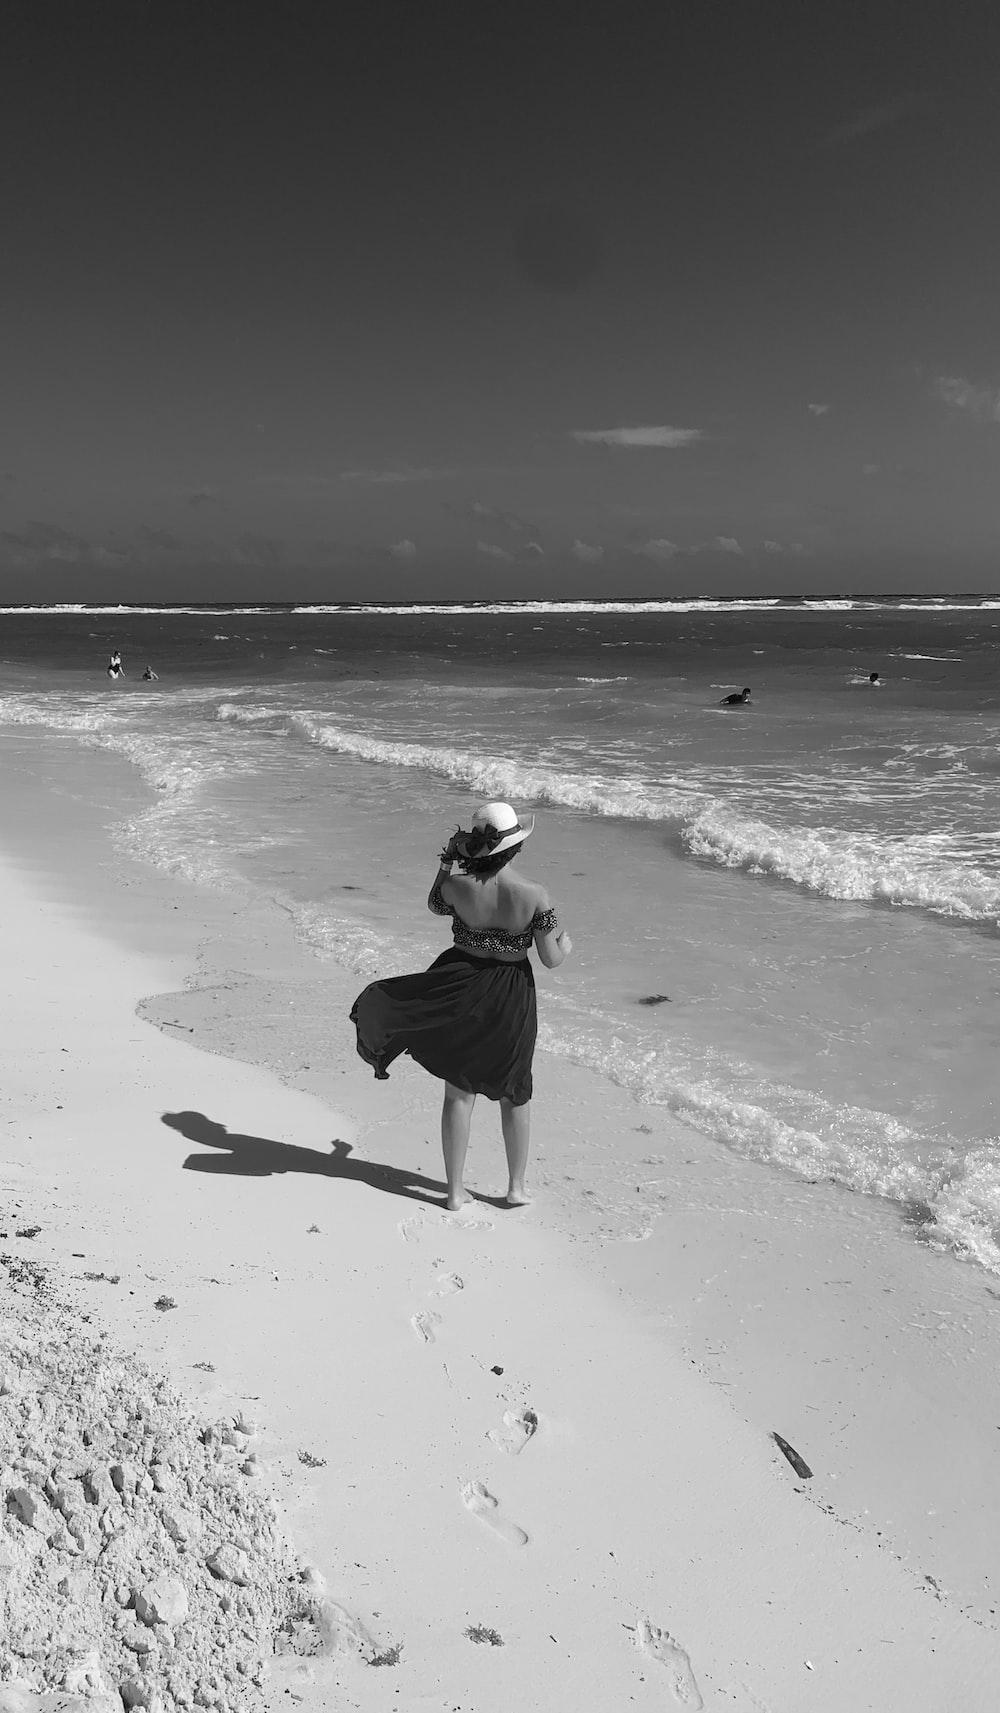 woman in black tank top and black pants walking on beach shore